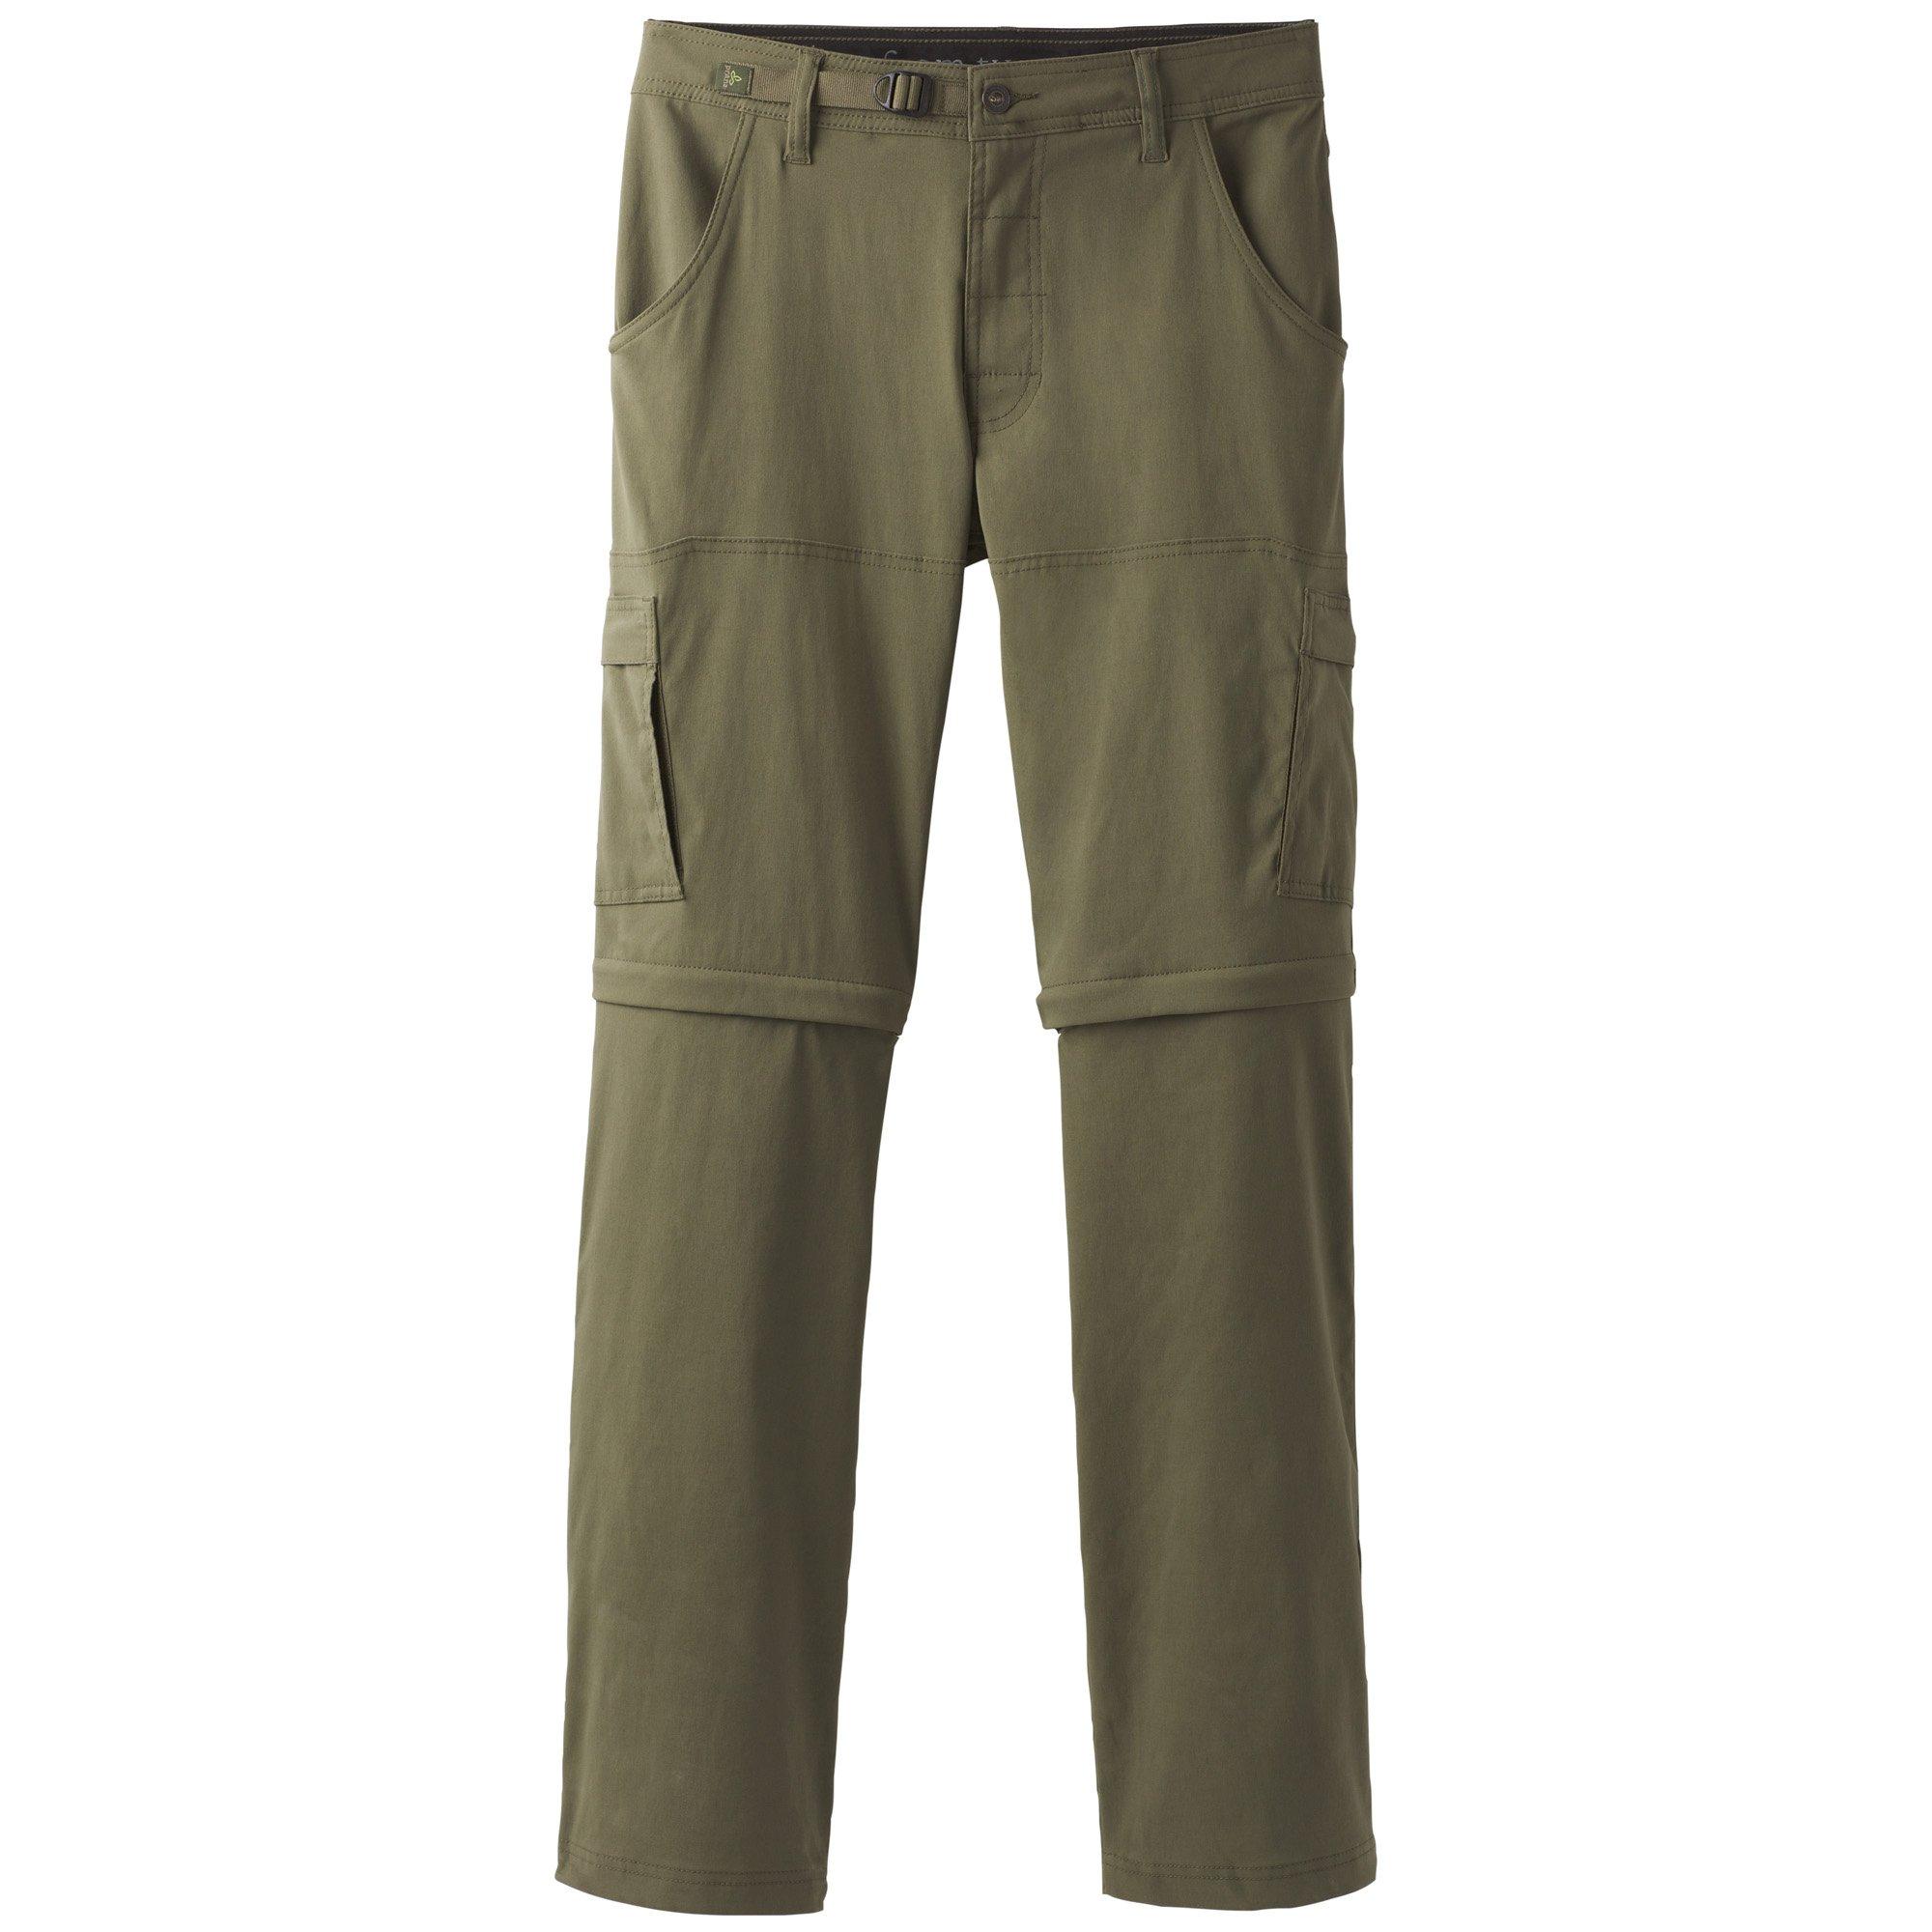 prAna Men's Stretch Zion Convertible 32'', Cargo Green, 28